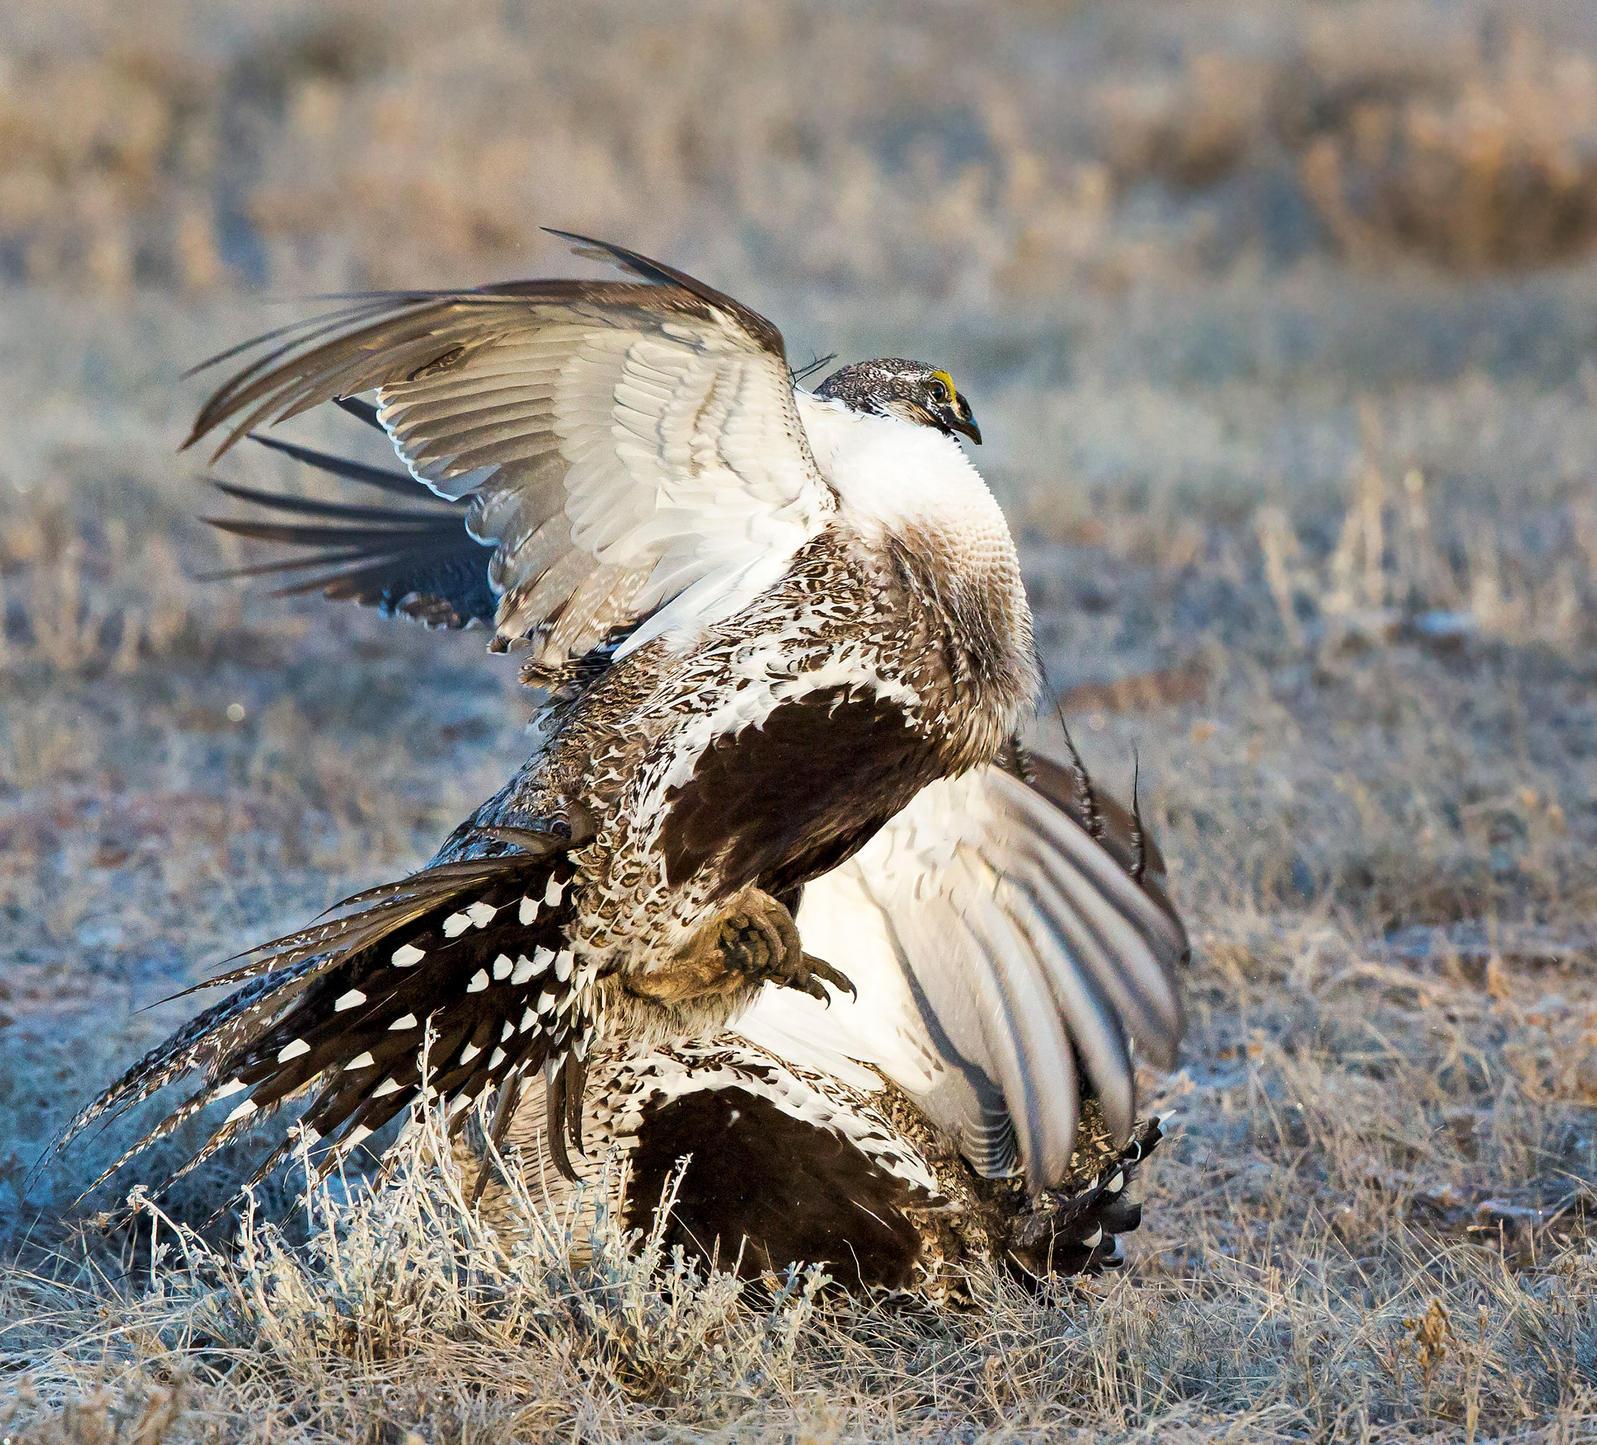 Grijalva says he may introduce legislation to protect a 2015 Greater Sage-Grouse conservation agreement. Odalys Muñoz Gonzalez/Audubon Photography Awards